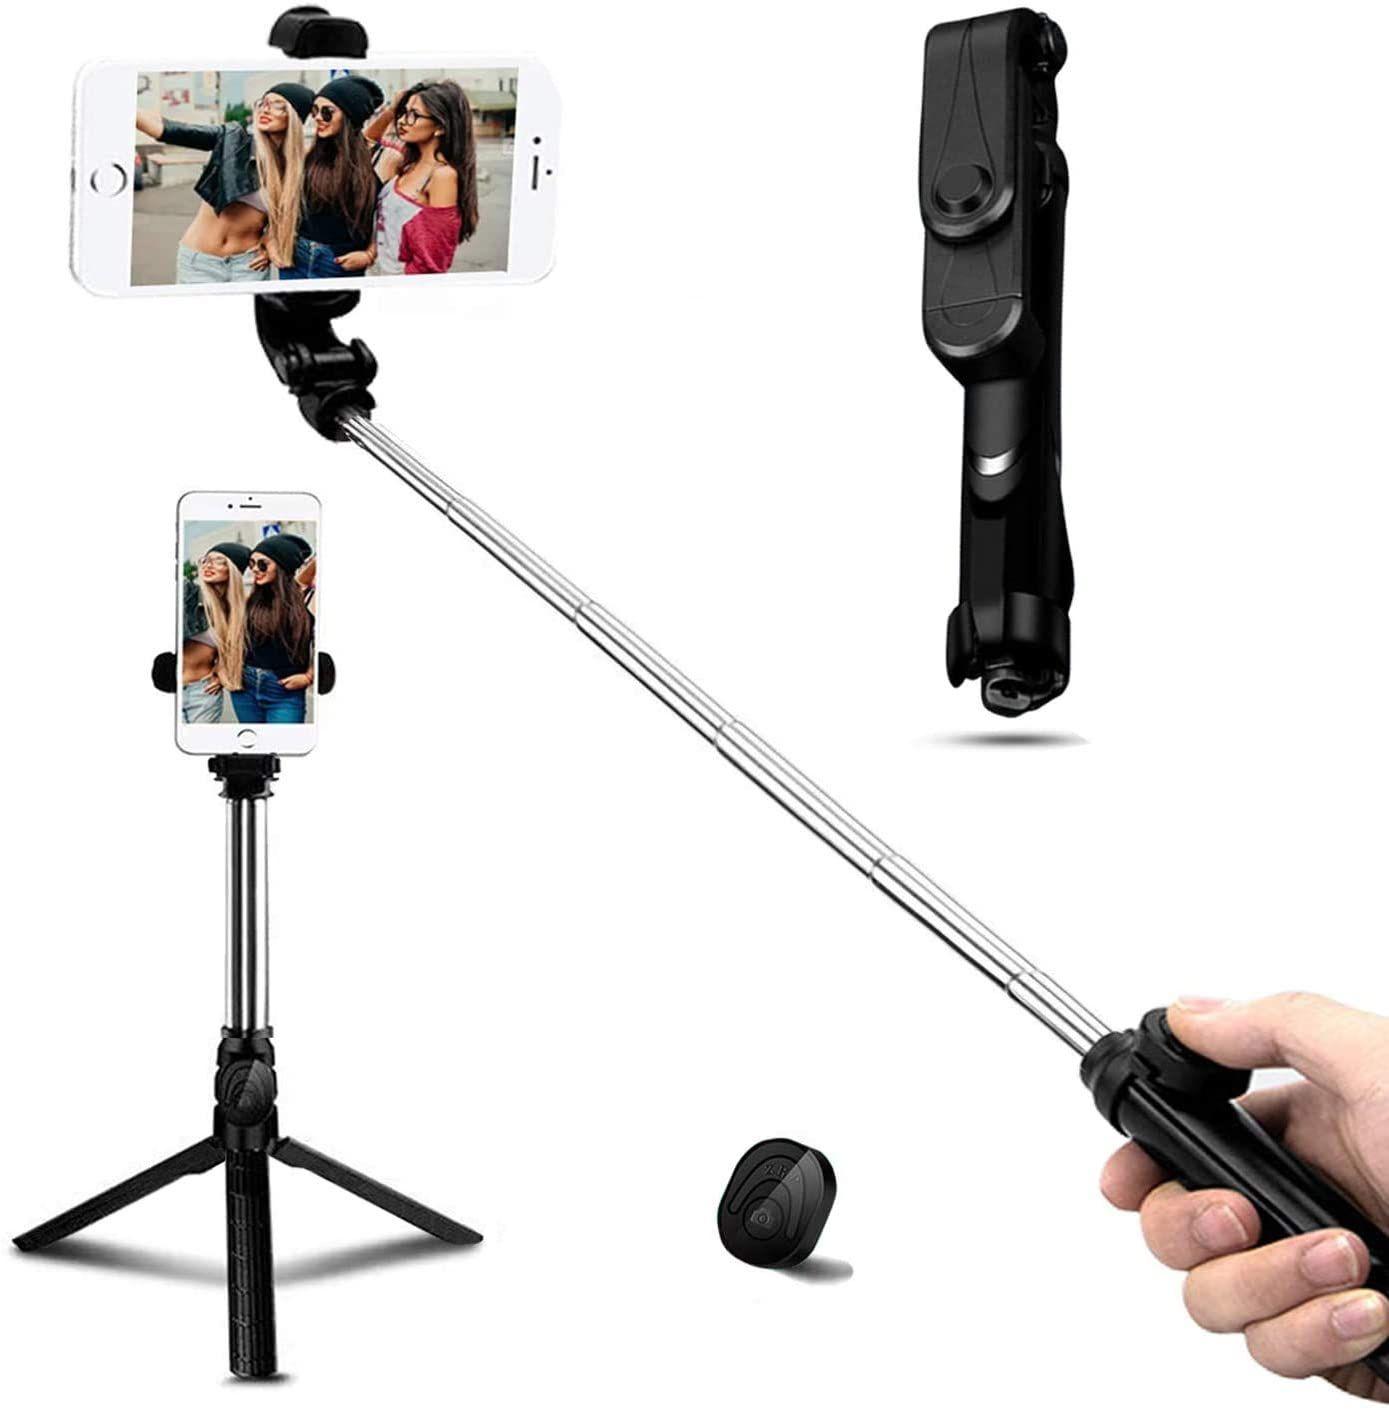 Palo Selfie Trípode, Bluetooth Selfie Stick Movil con Control Remoto 360°